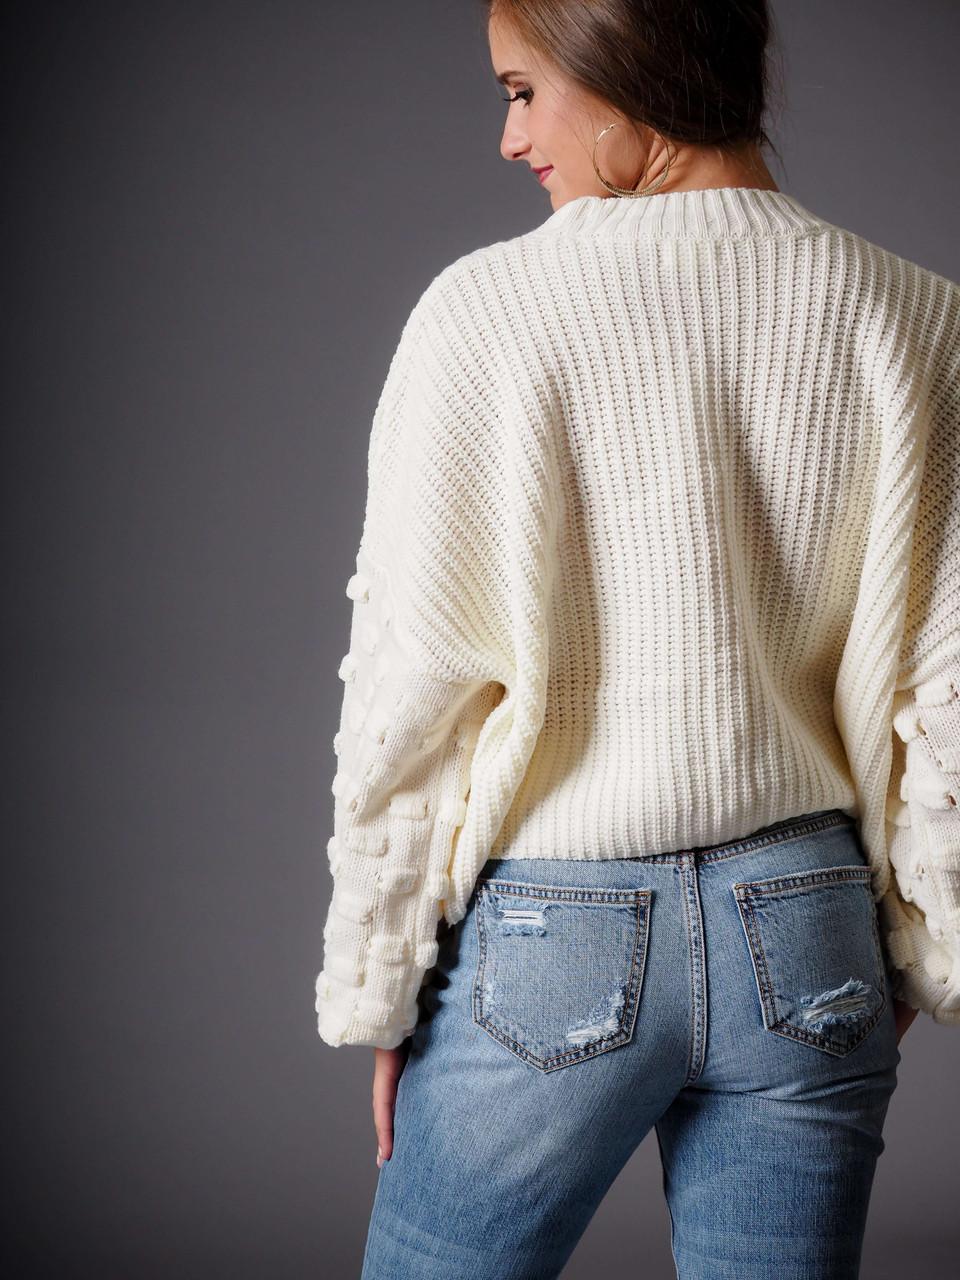 ivory cream knit sweater